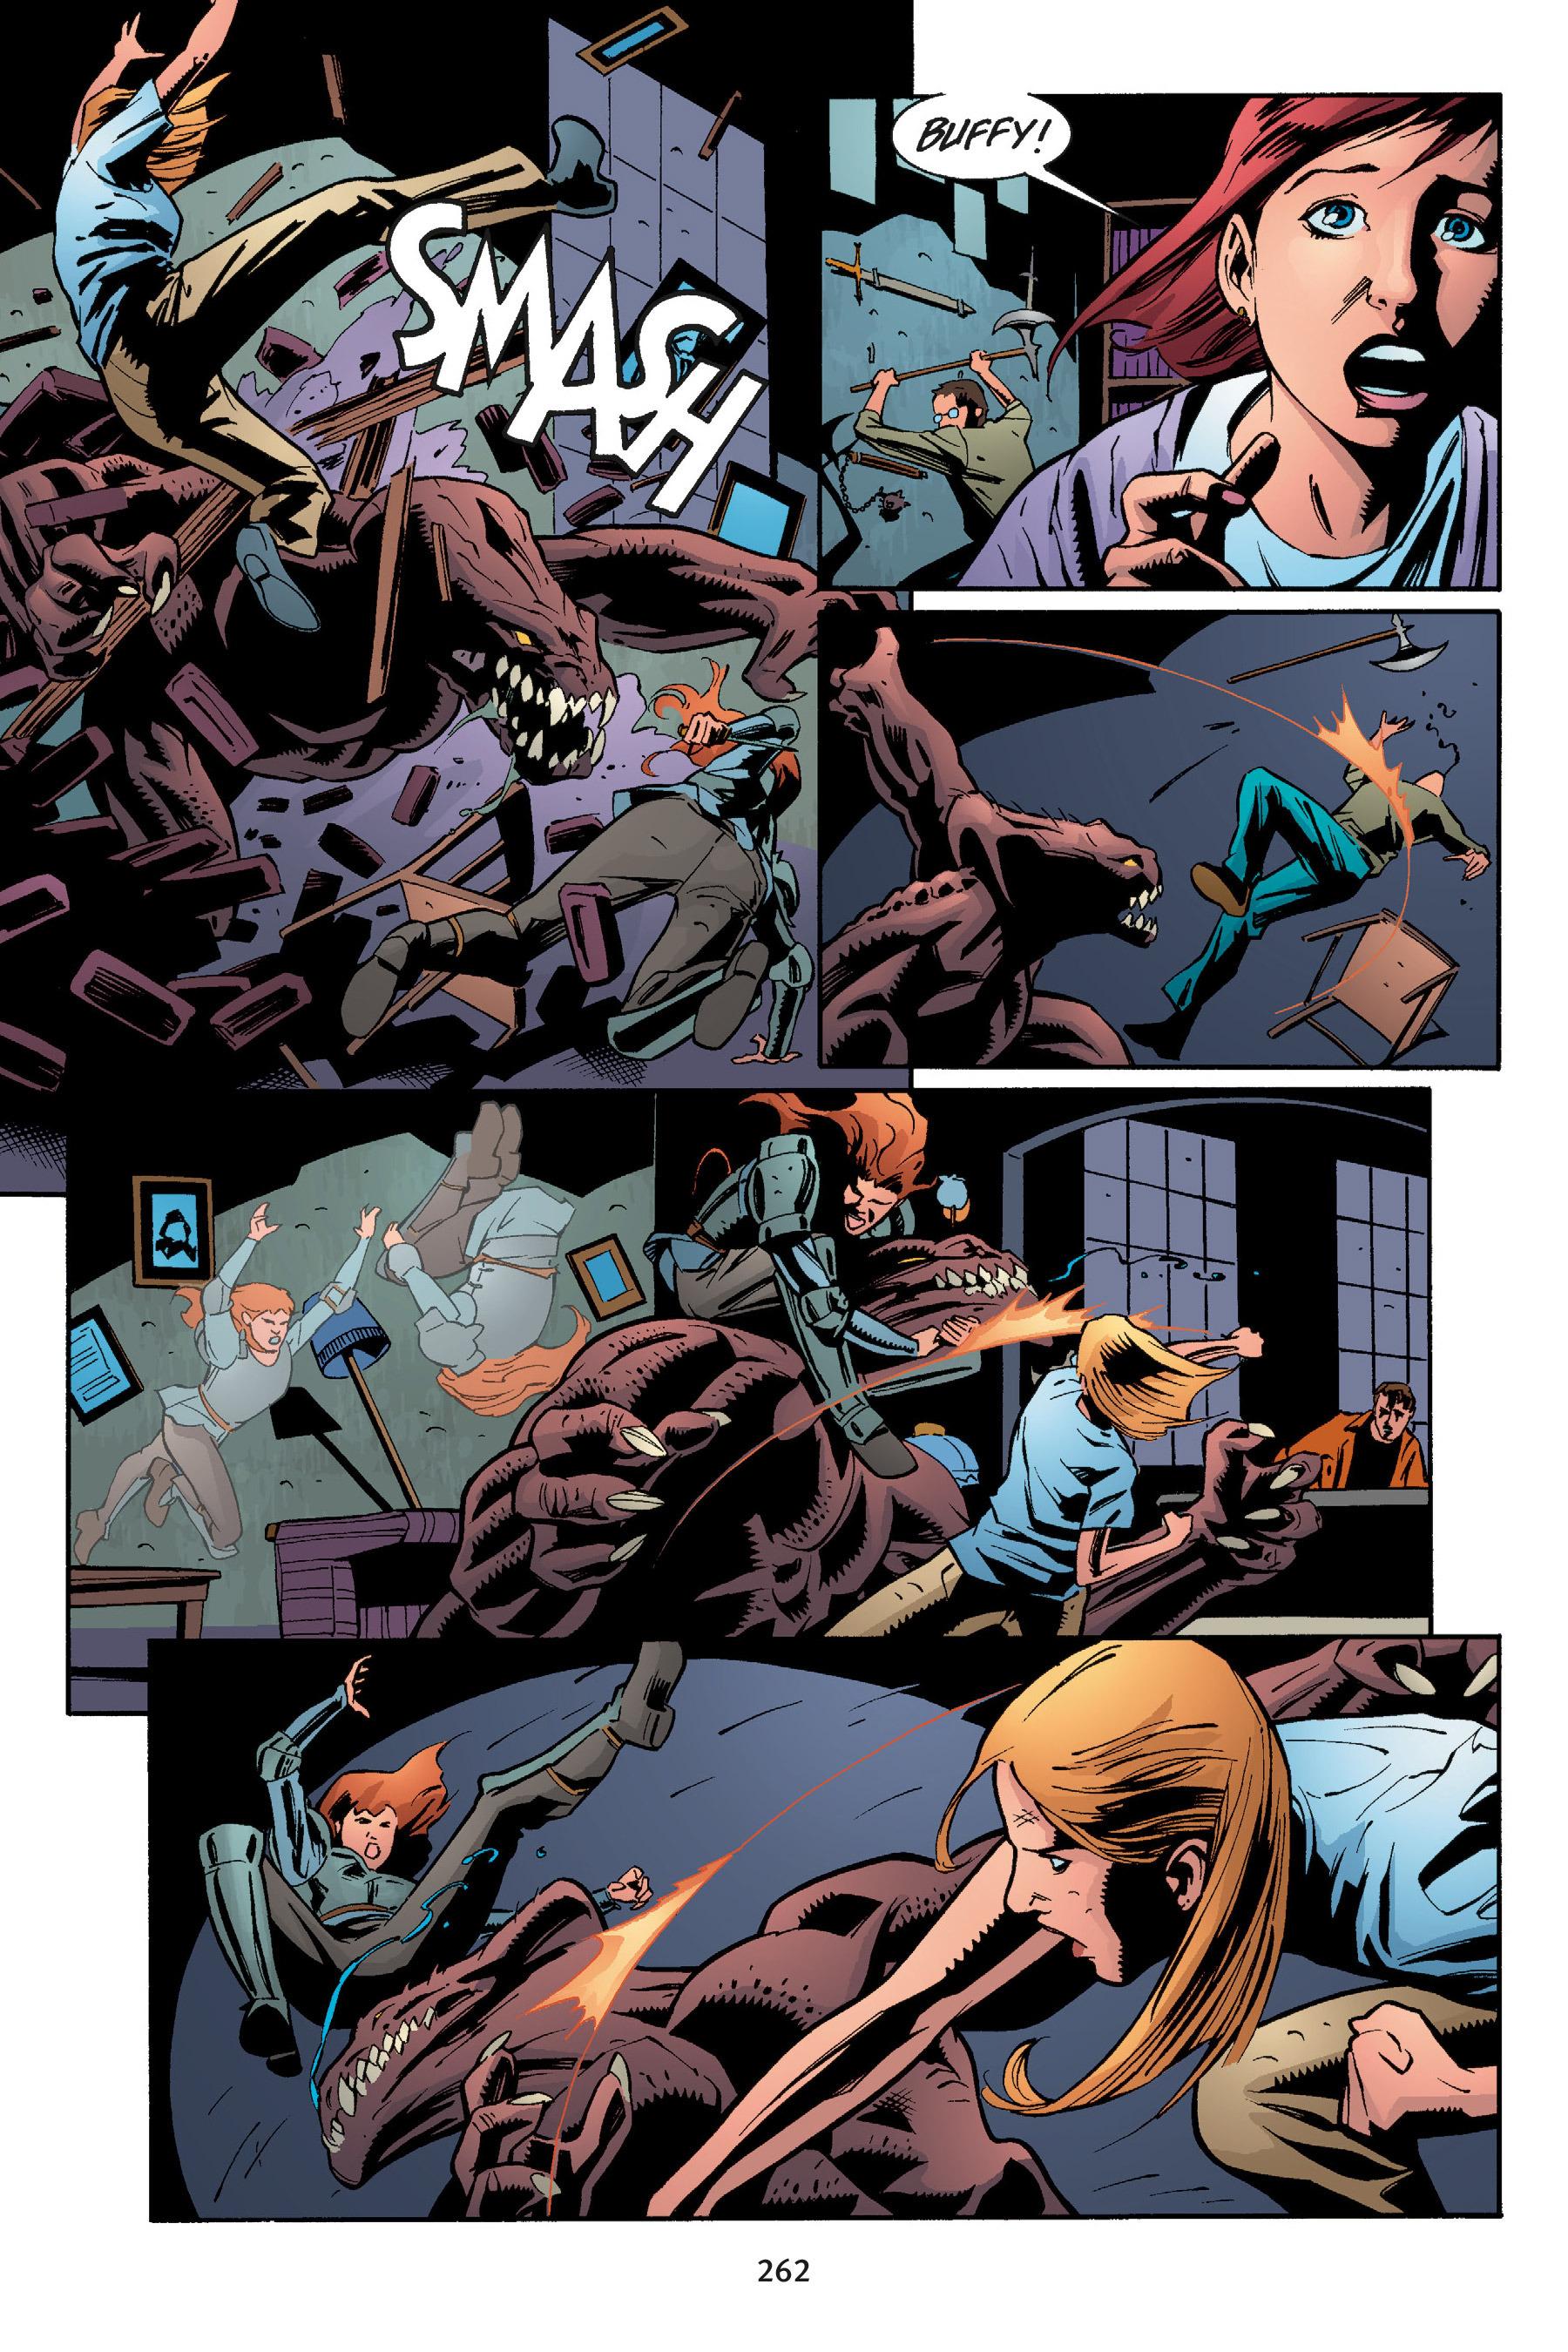 Read online Buffy the Vampire Slayer: Omnibus comic -  Issue # TPB 5 - 261